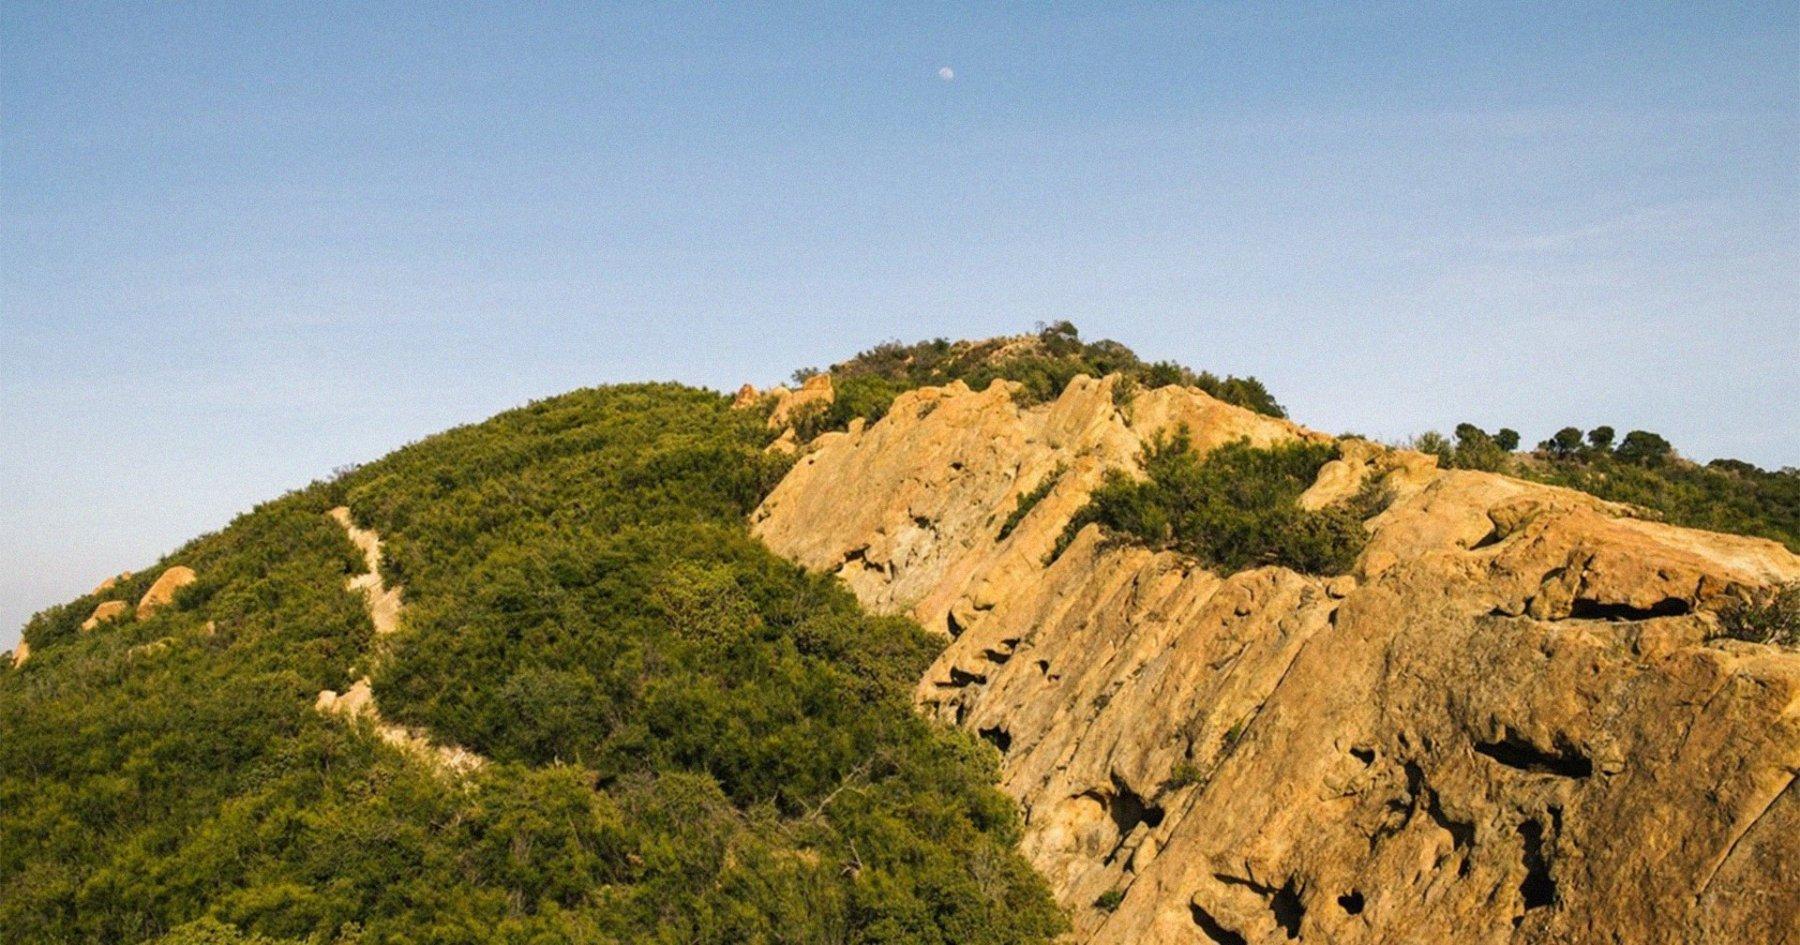 Saddle Peak is an Easy Urban Hike